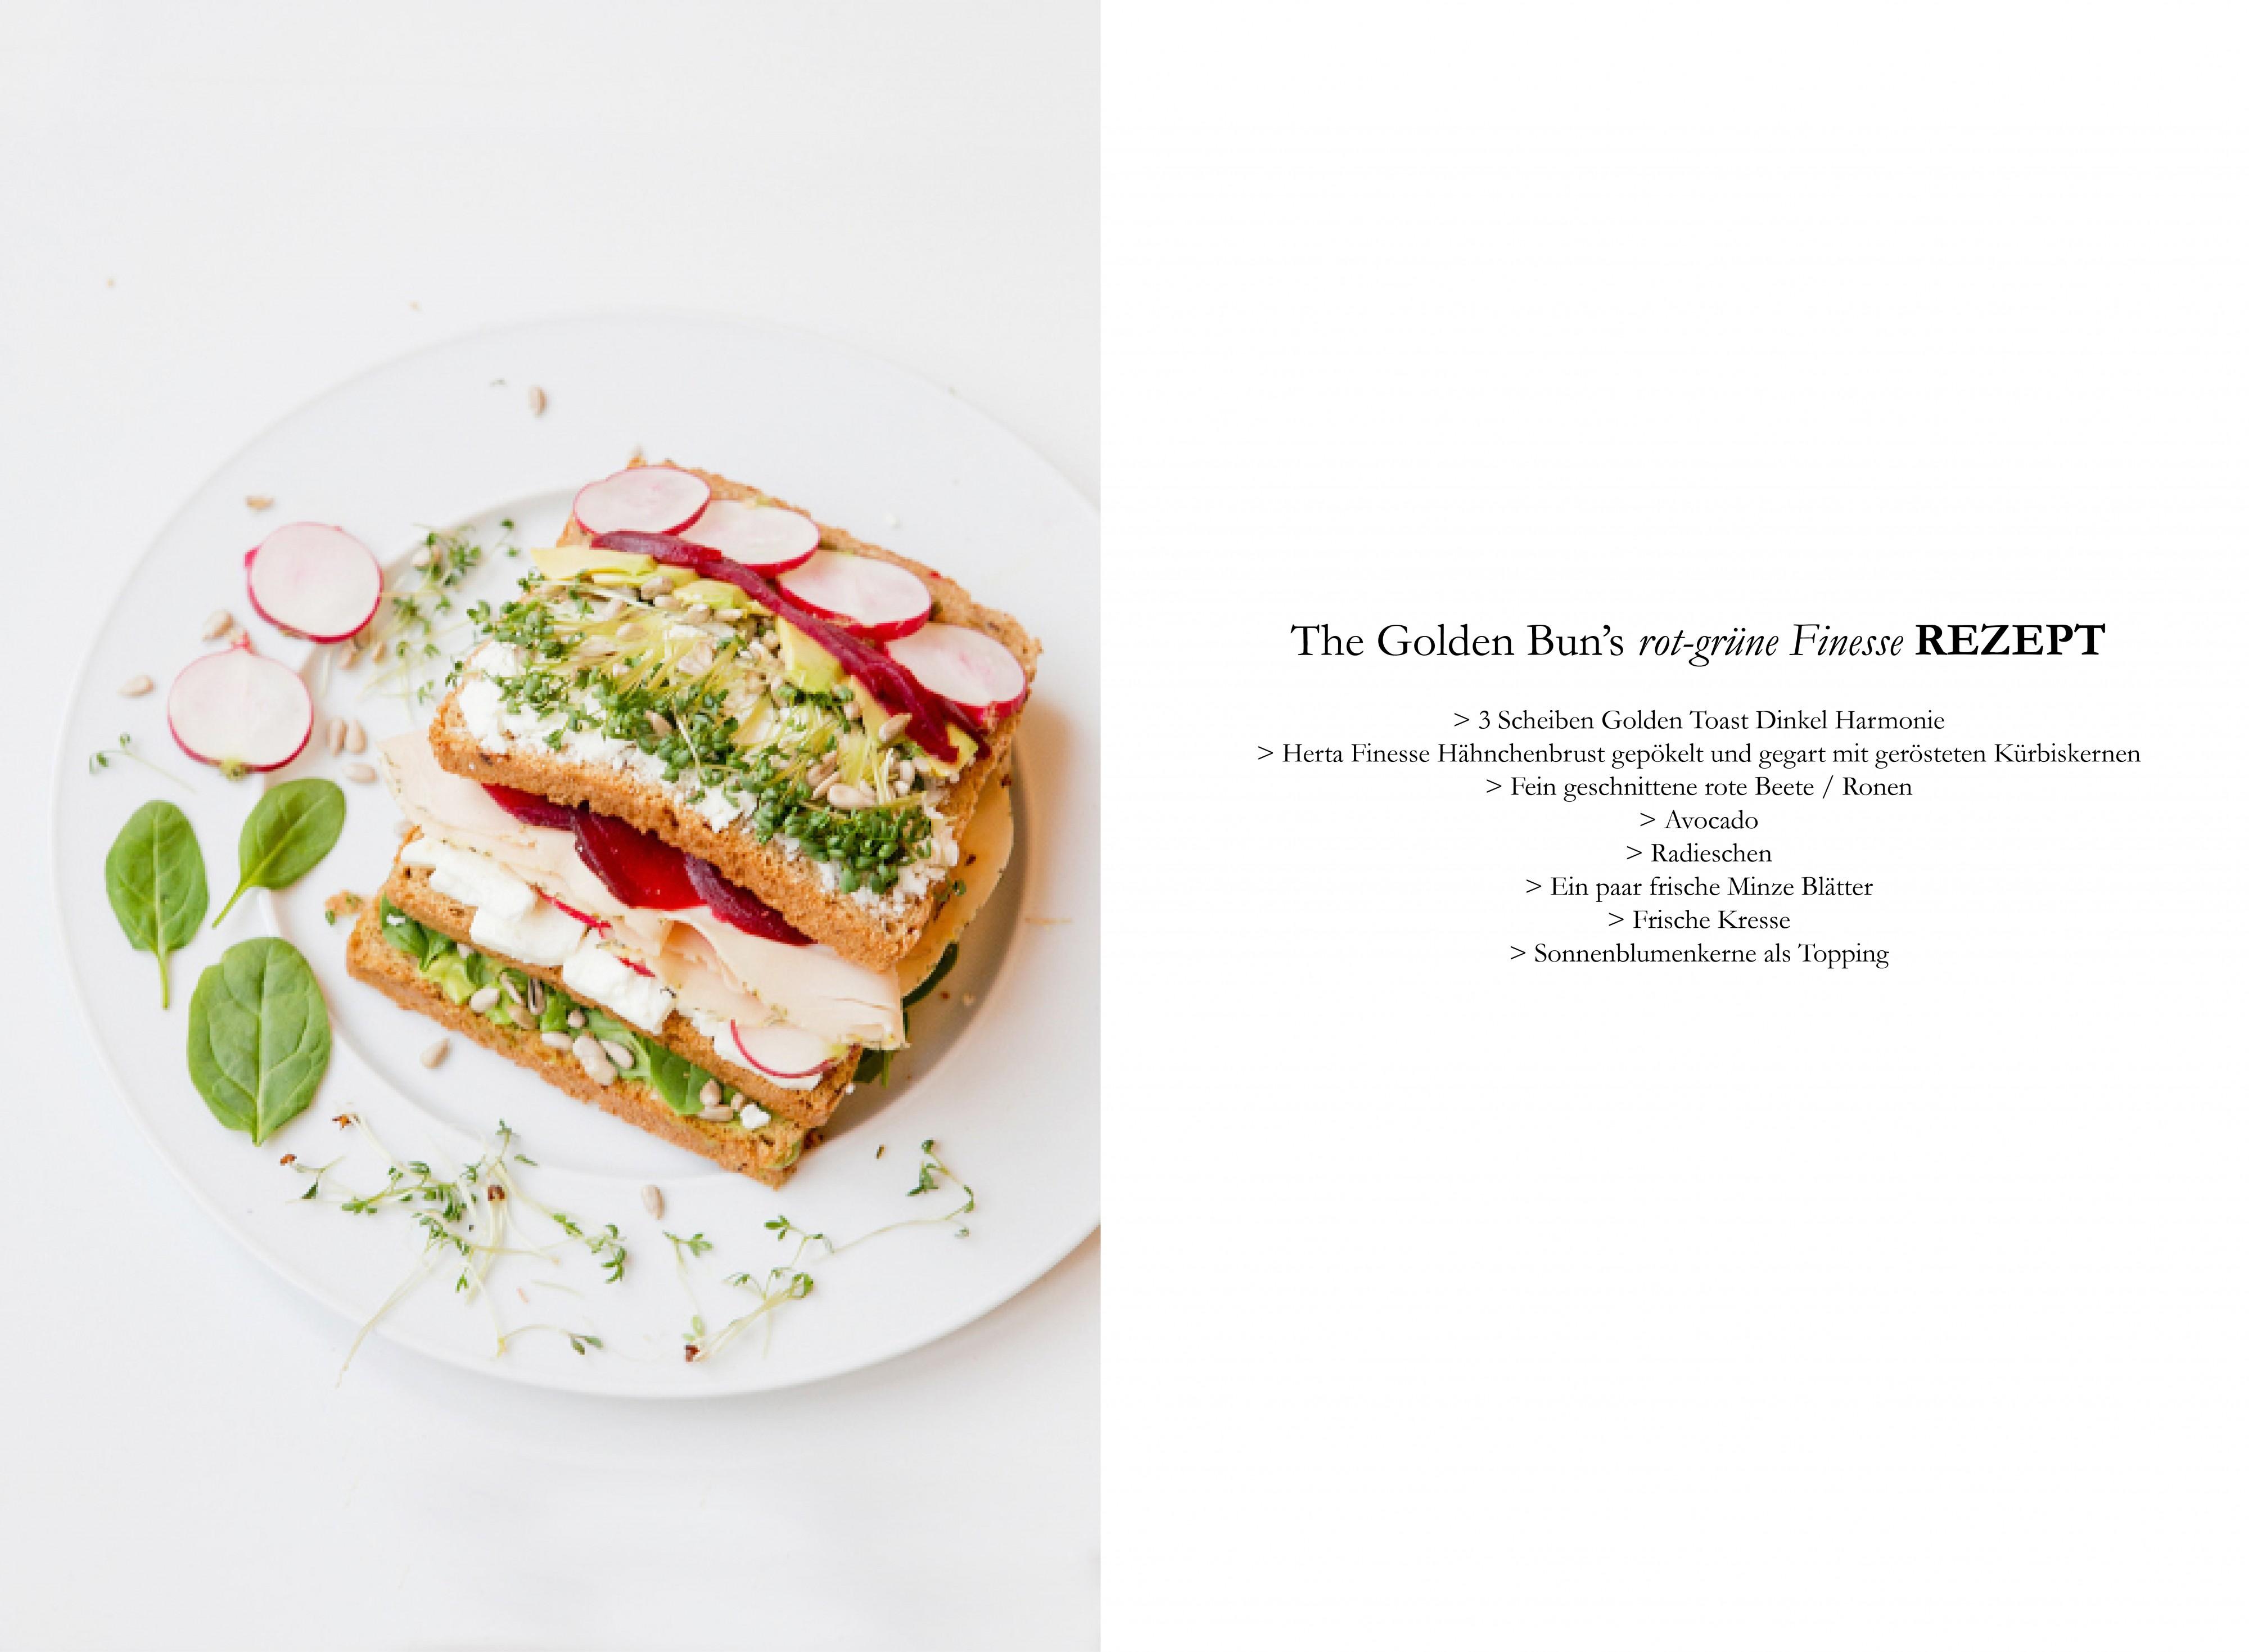 www.thegoldenbun.com |herta finesse blogger event sandwich atelier